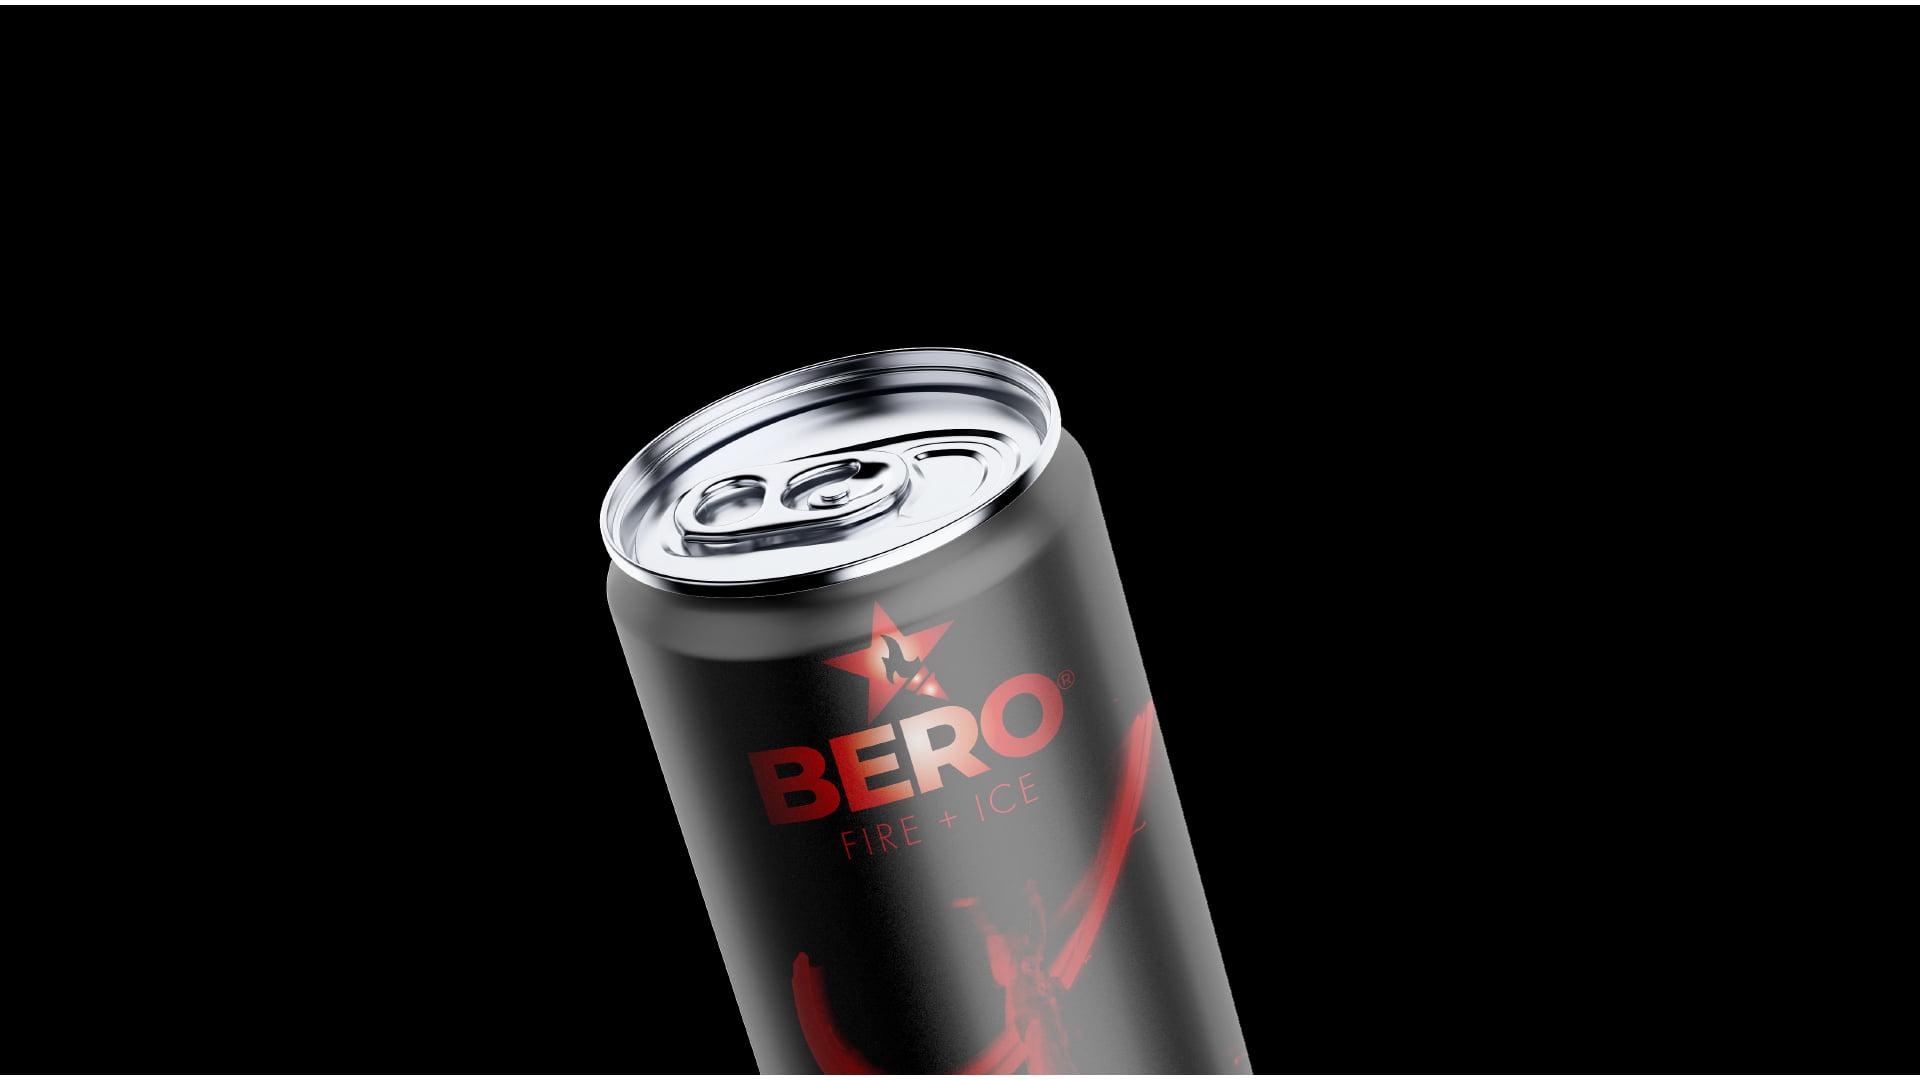 BERO Energydrink